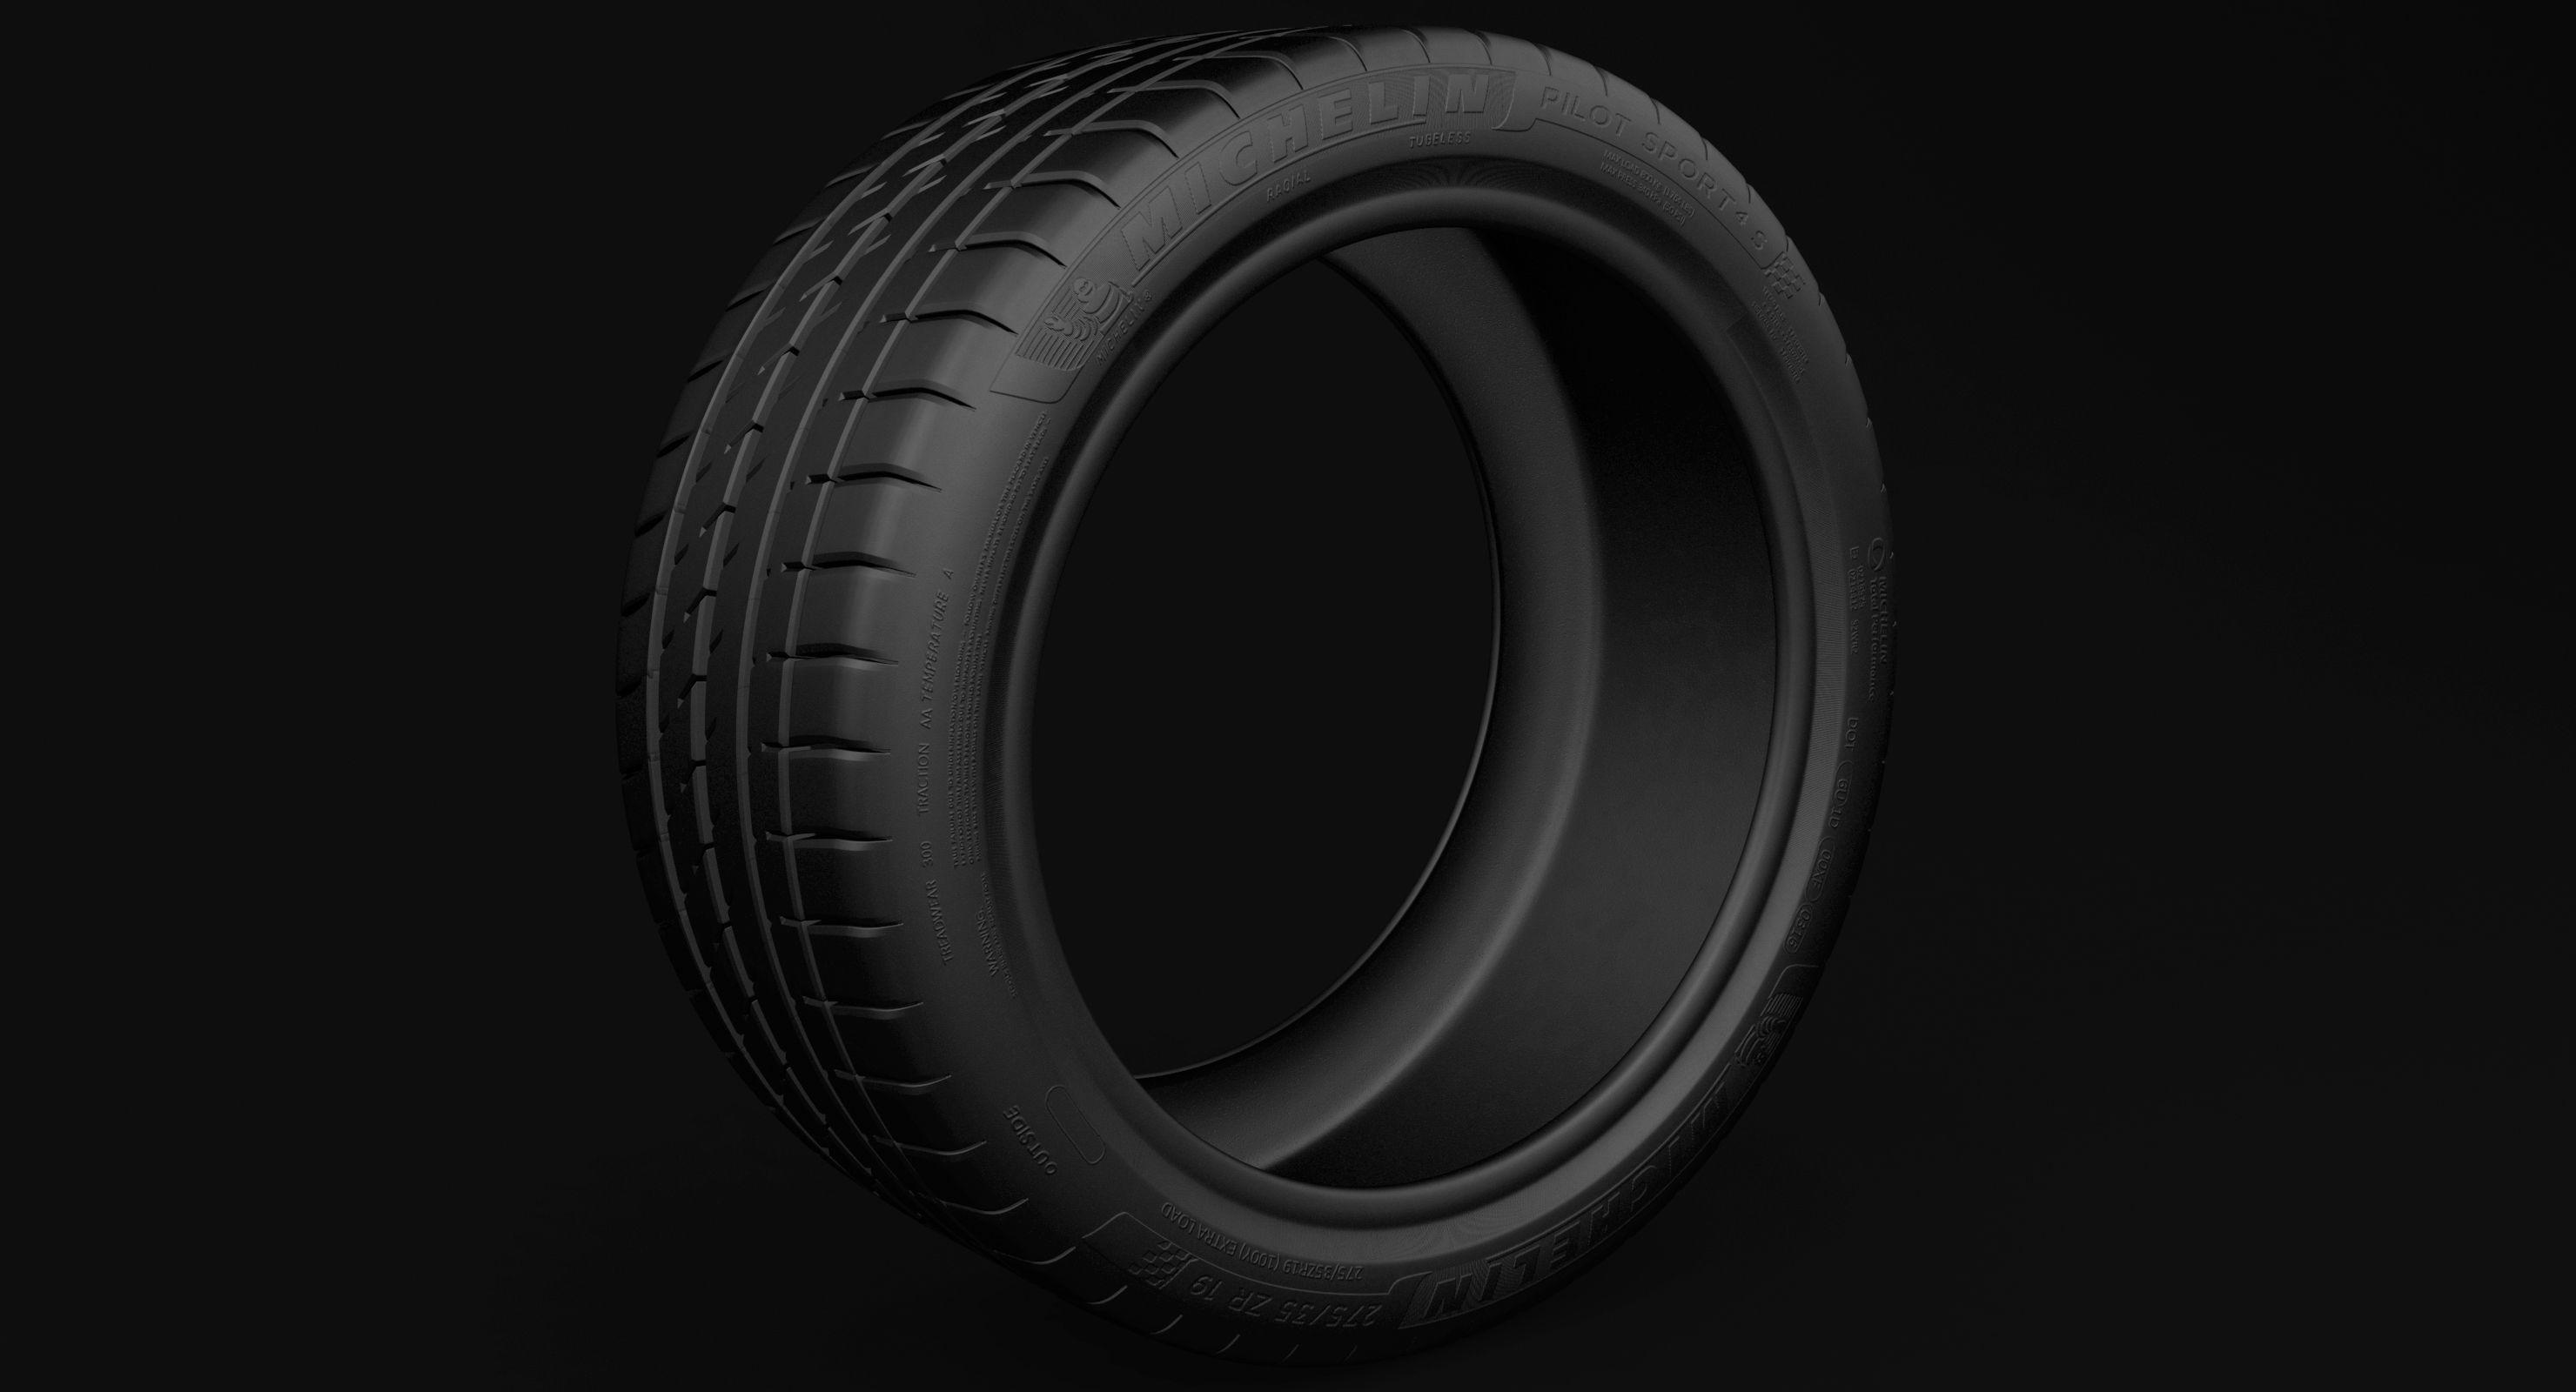 Tire - Michelin Pilot Sport 4 s